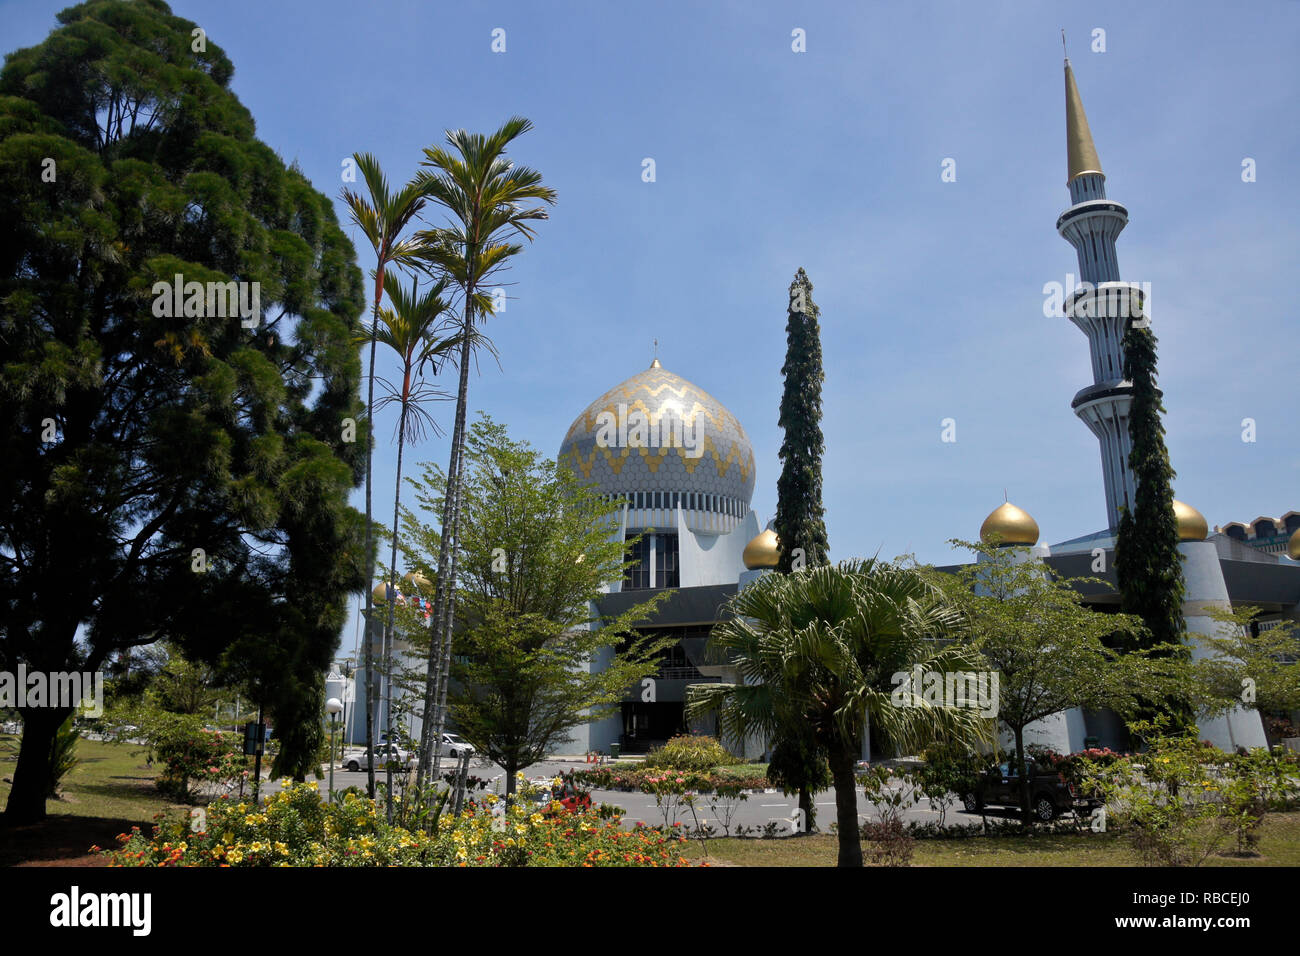 State Mosque, Kota Kinabalu, Sabah (Borneo), Malaysia - Stock Image